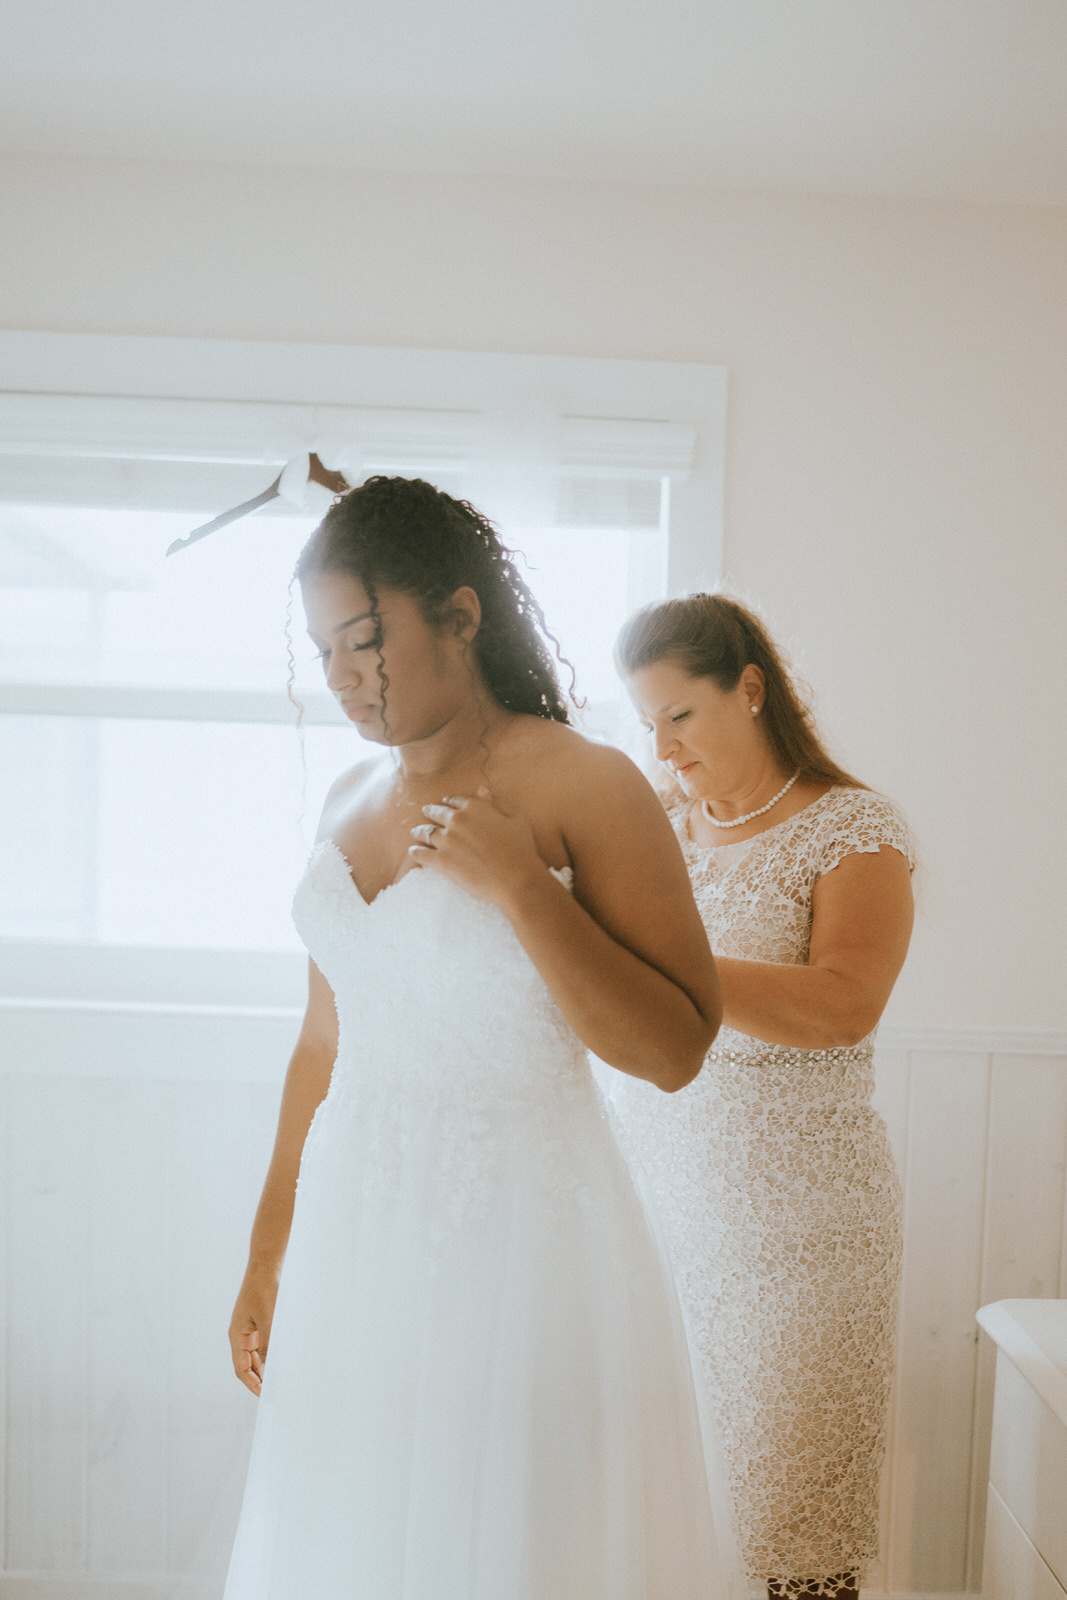 South Seas Island Resort Elopement- Alyana and Shawn- Michelle Gonzalez Photography-47.JPG